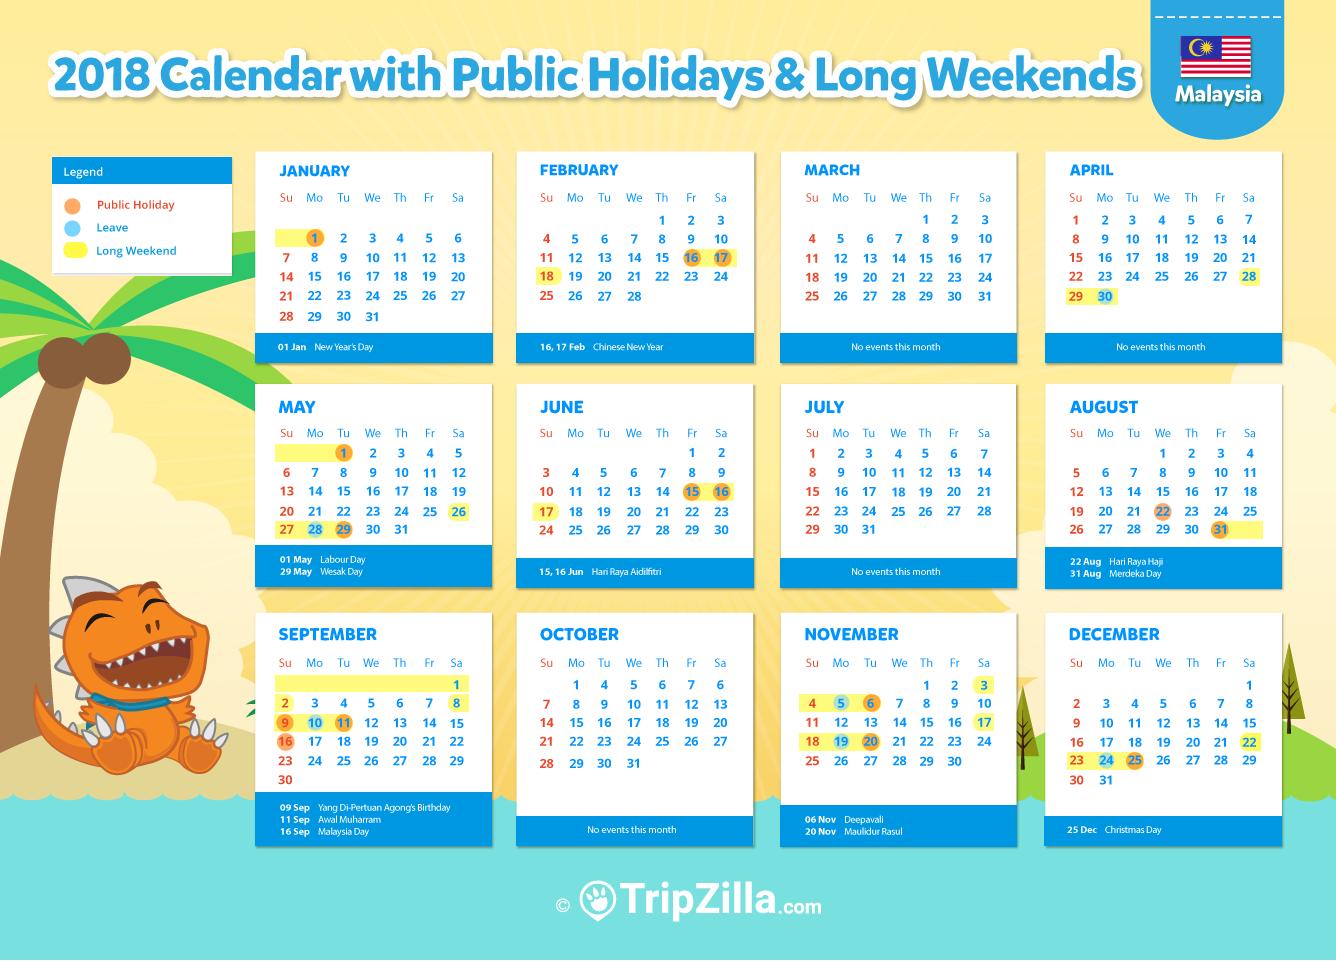 10 Long Weekends in Malaysia in 2018.